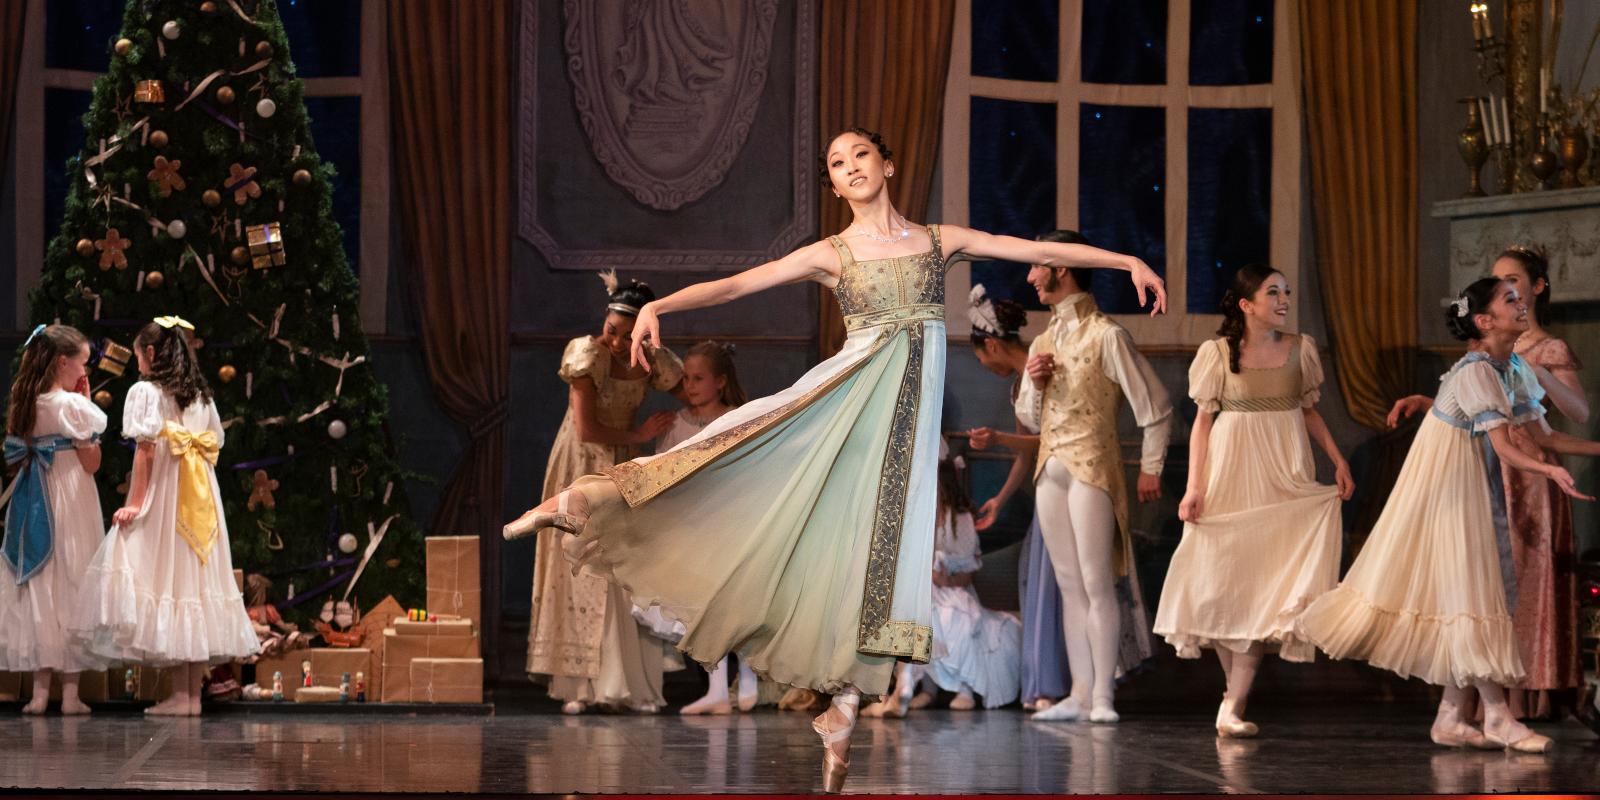 Northern Ballet's The Nutcracker